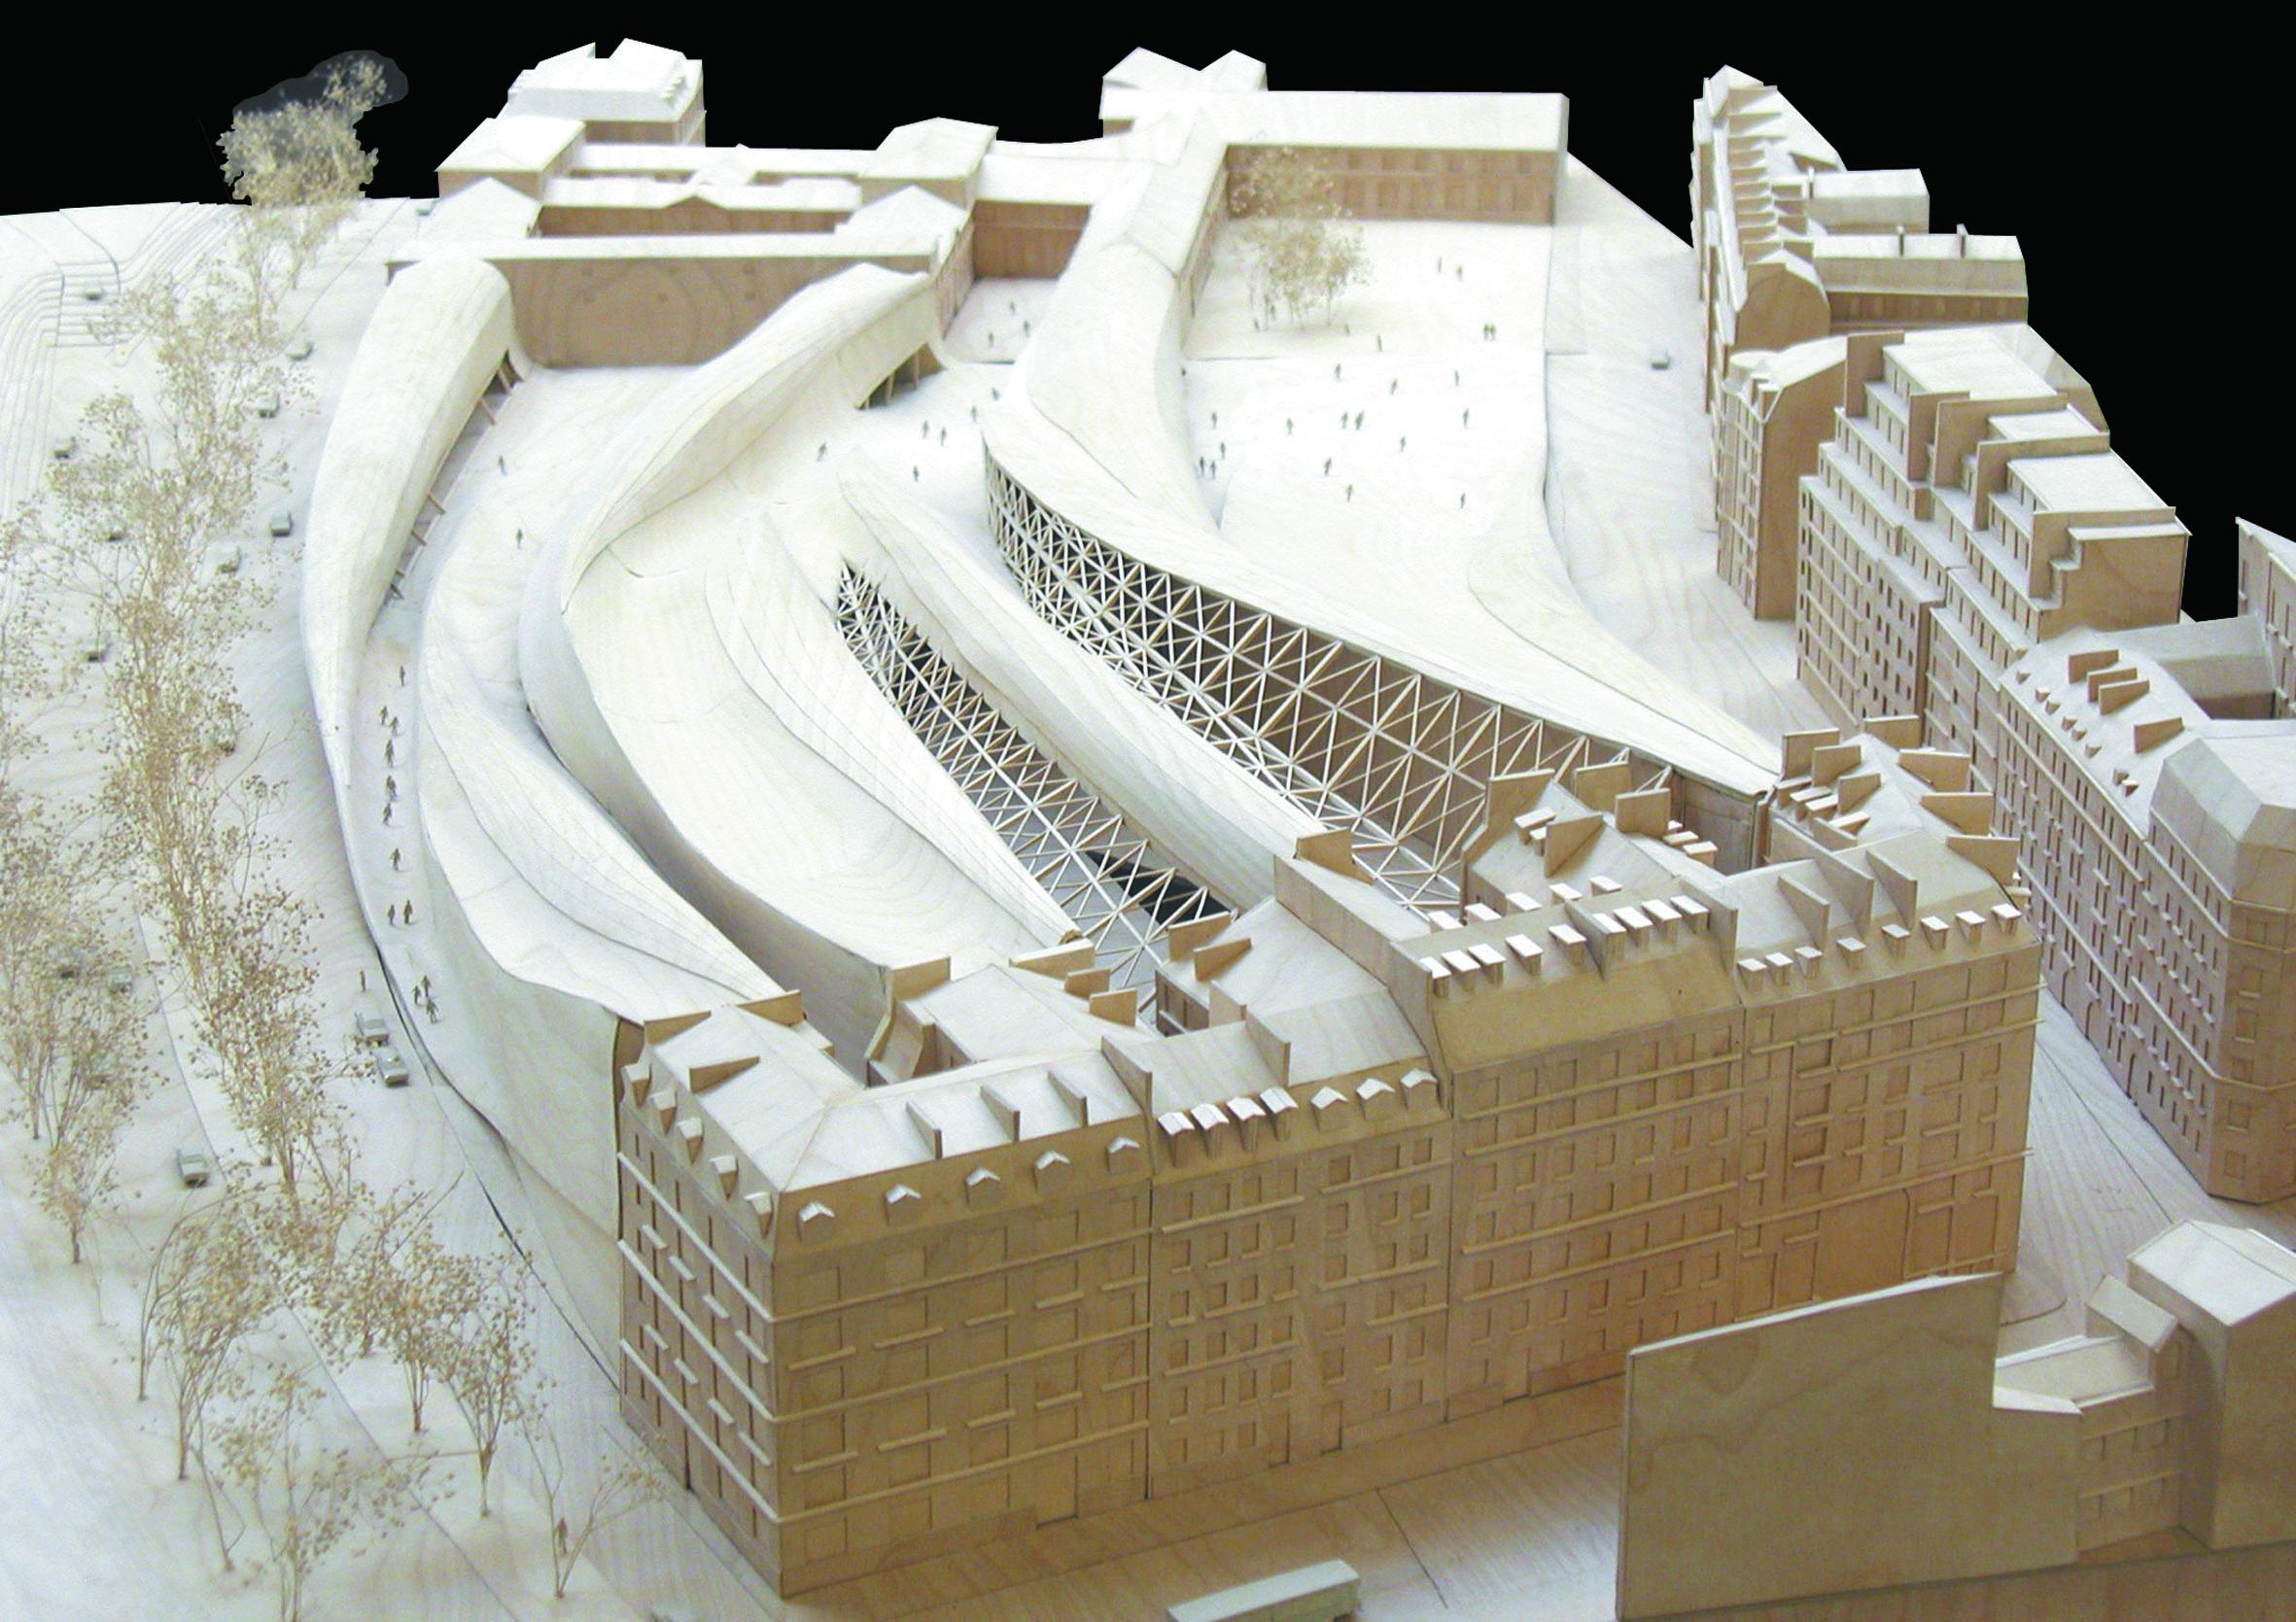 Eisenman's unrealized Qaui Branly Museum in Paris